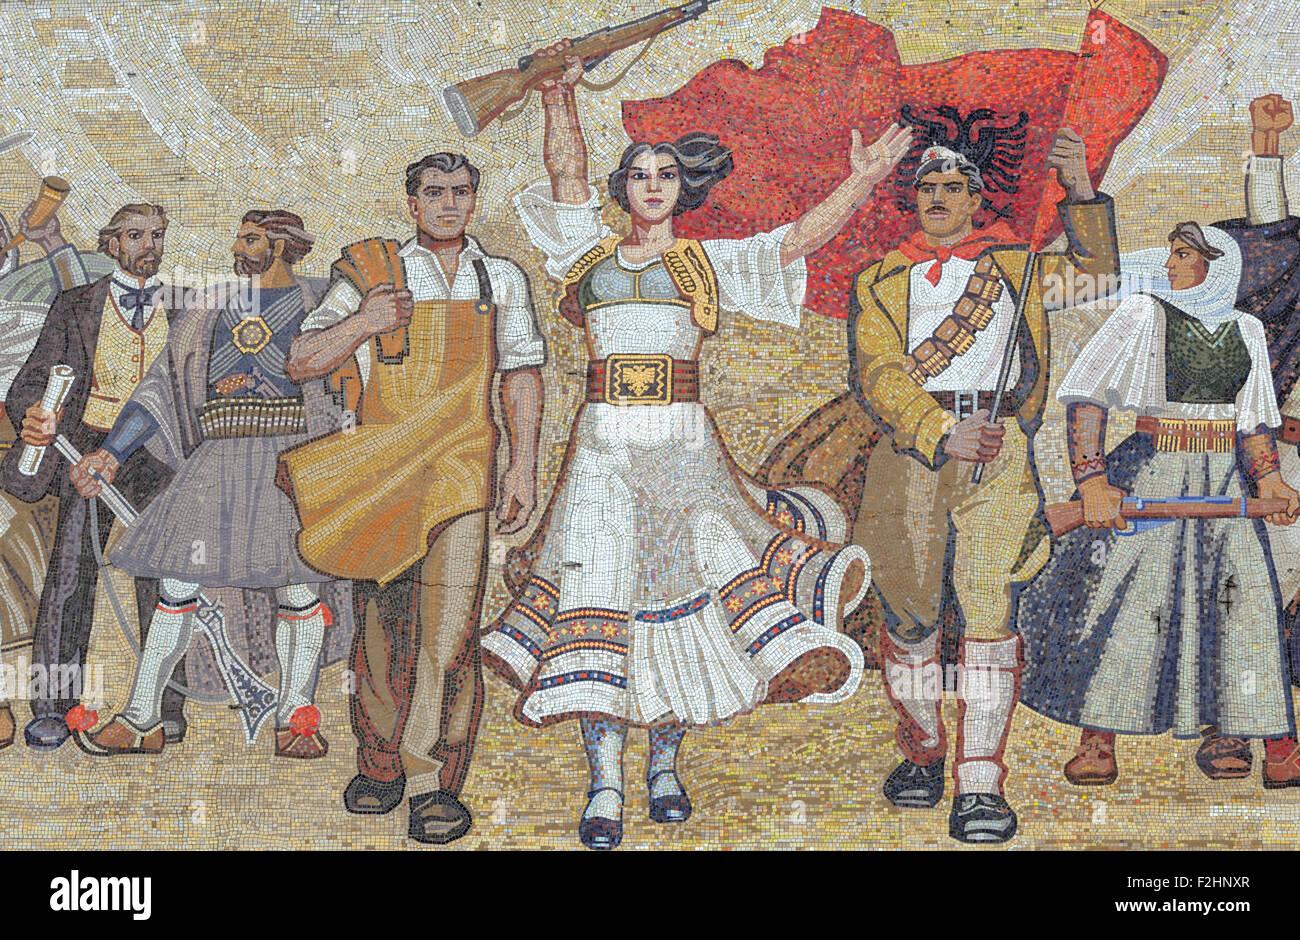 The Albanians mosaic on the front of the Albanian National Historical Museum, Muzeu Historik Kombëtar, in Tirana. - Stock Image